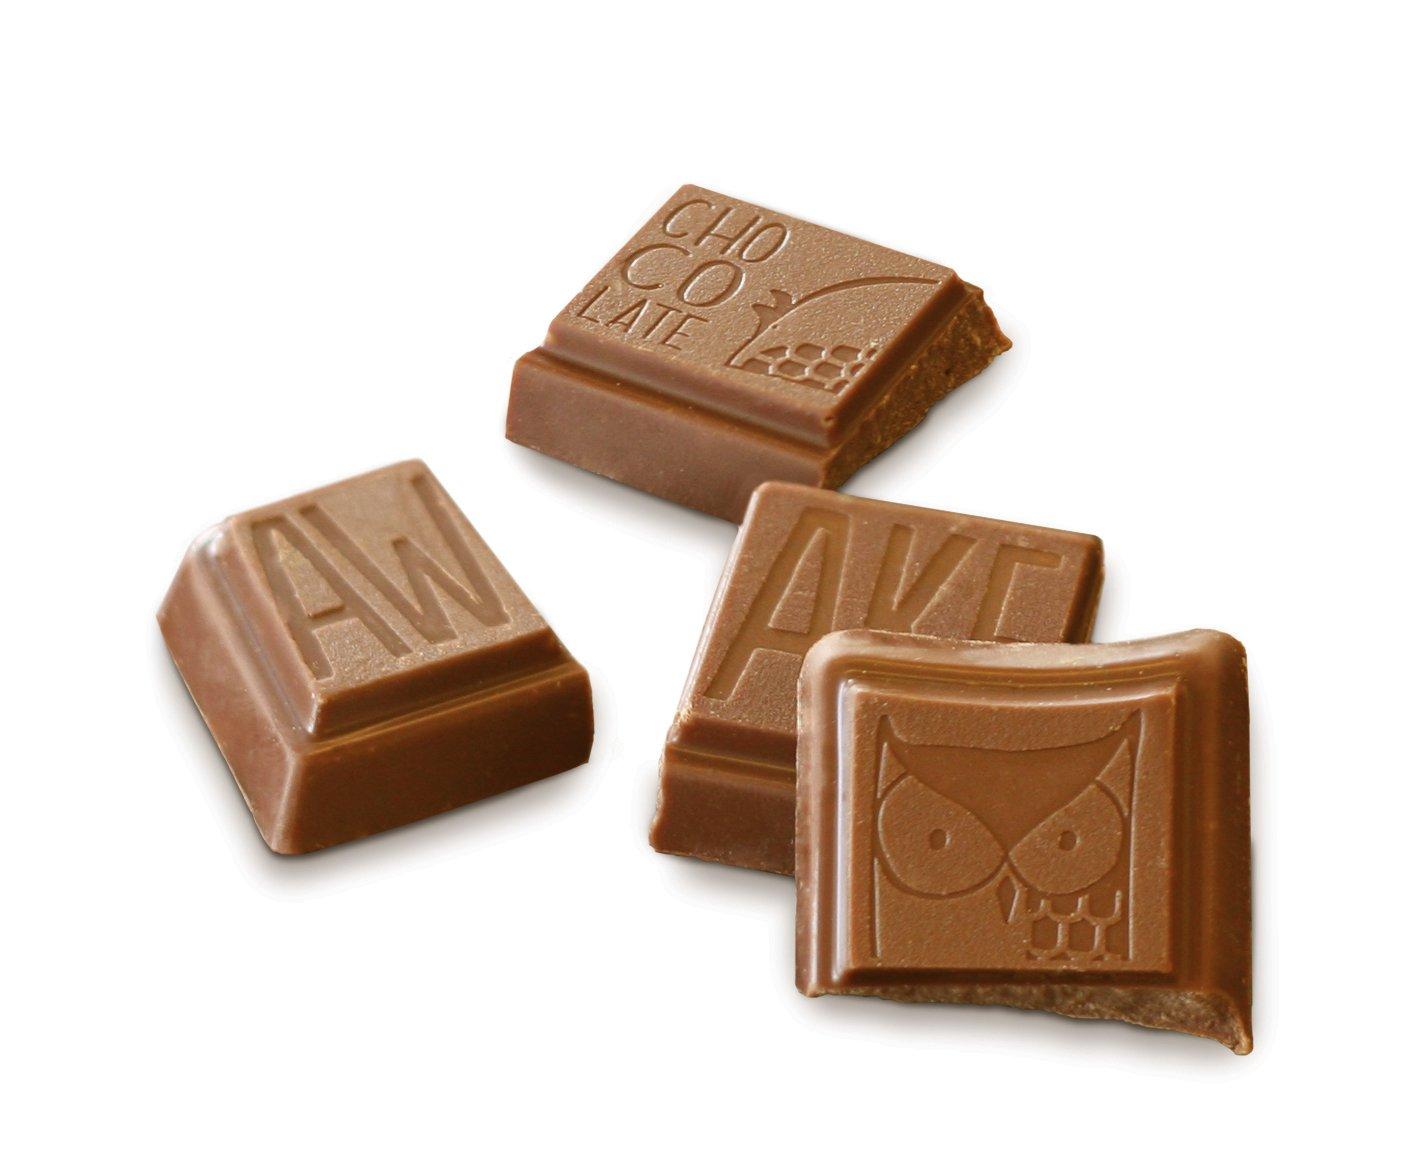 AWAKE Caffeinated Chocolate Bars – Milk Chocolate with Caffeine ...